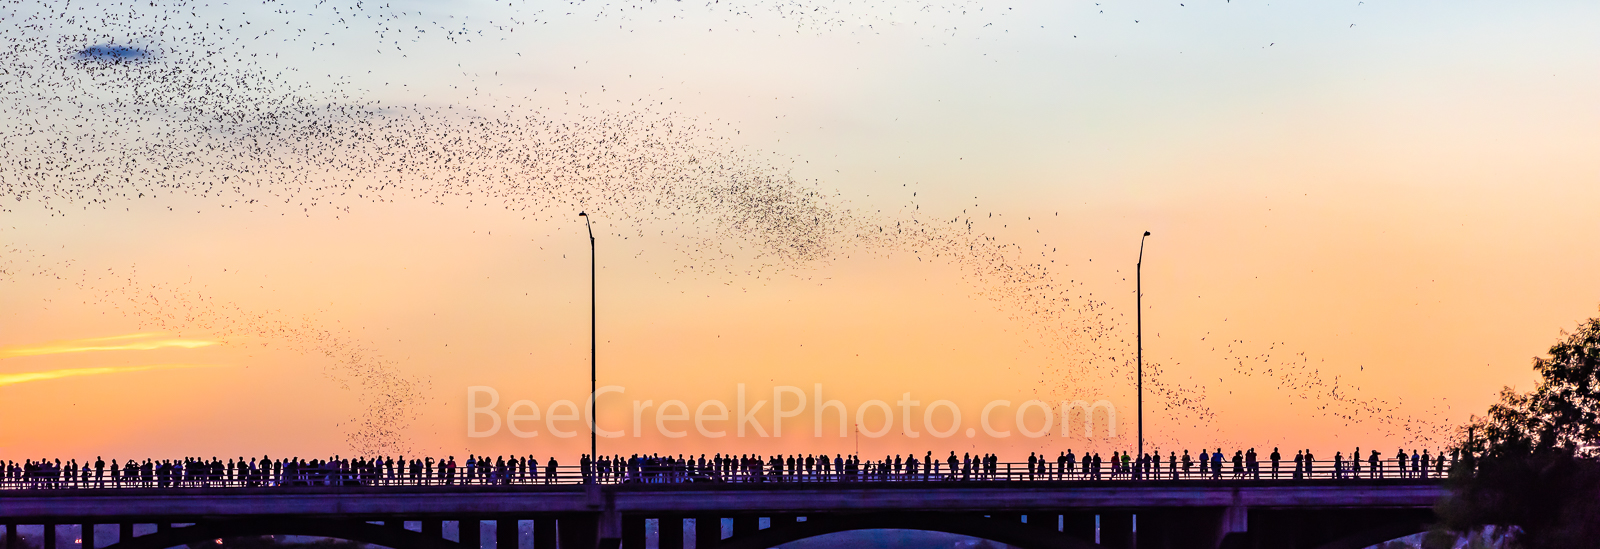 Austin Congress Bats Panorama, Austin, Congress, Bats, baby bats, mexican free tail bats, bridge, downtown, Ann Richard Congress Bridge, dusk, people, crowds, , sky, Line, Radisom, hotels, Hyatt, pano, photo